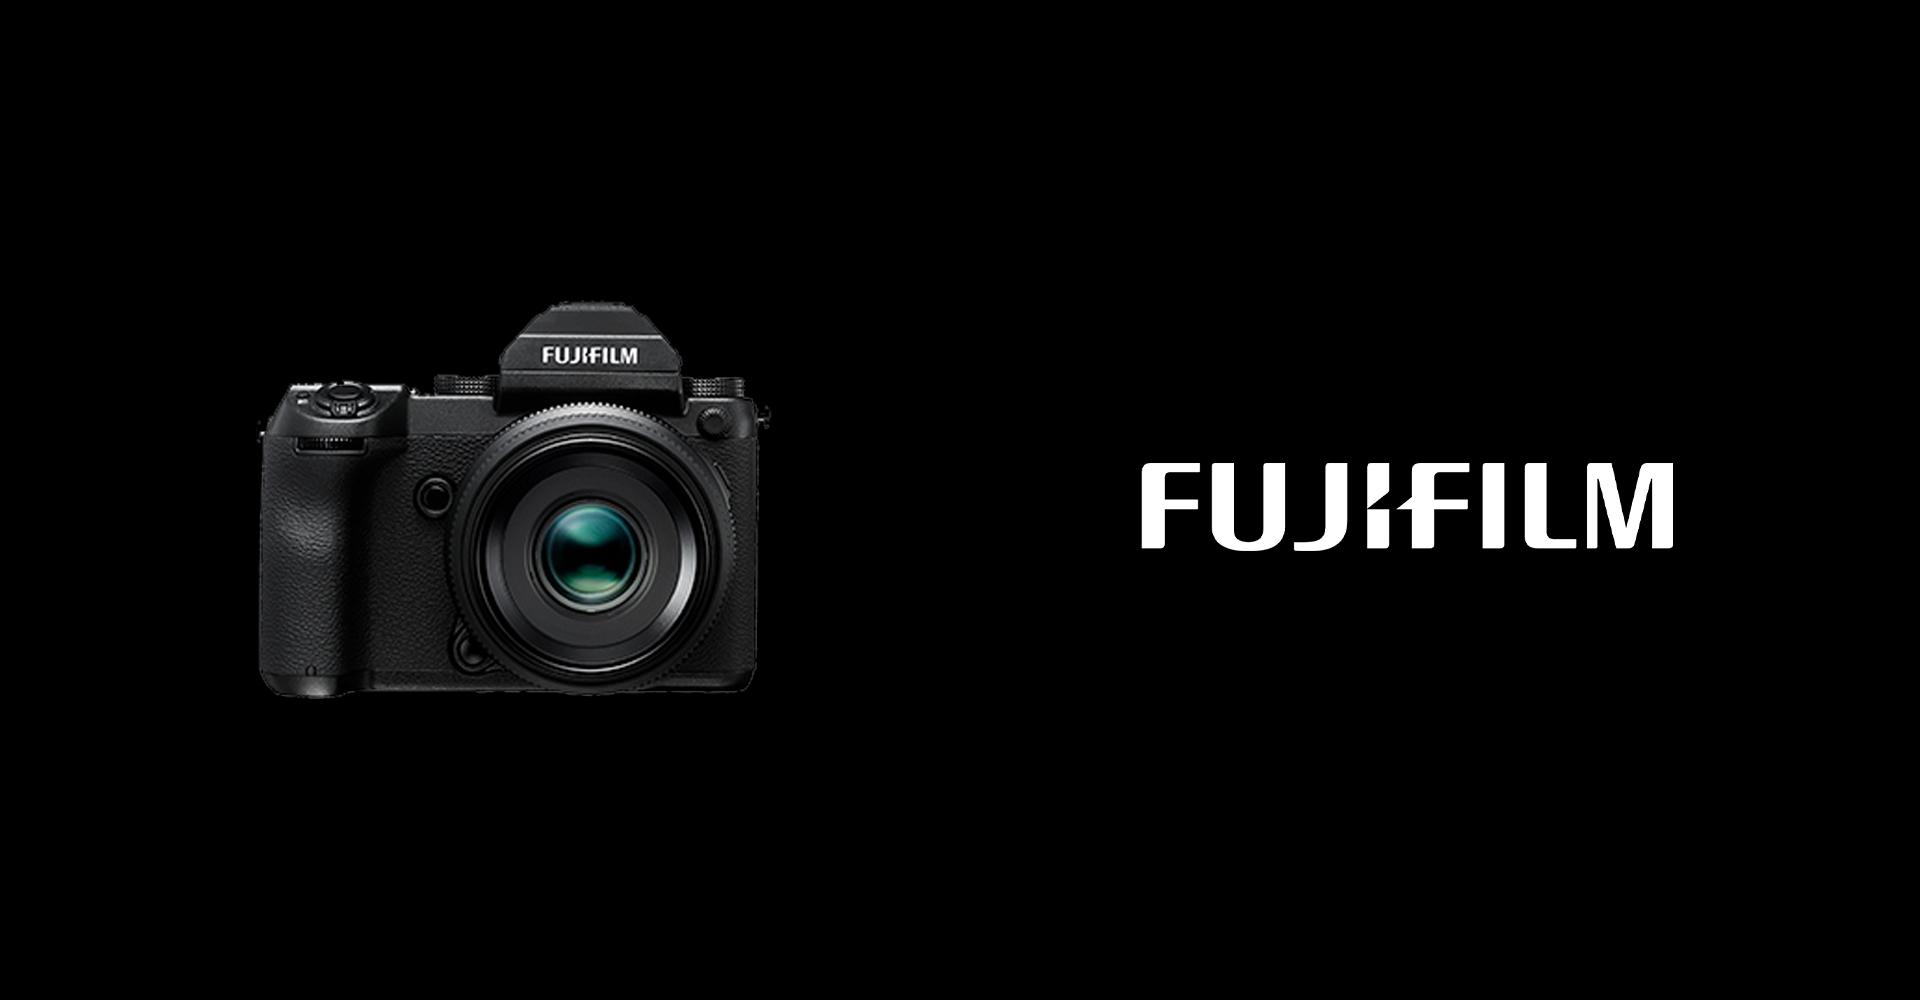 Fujifilm Markenshops